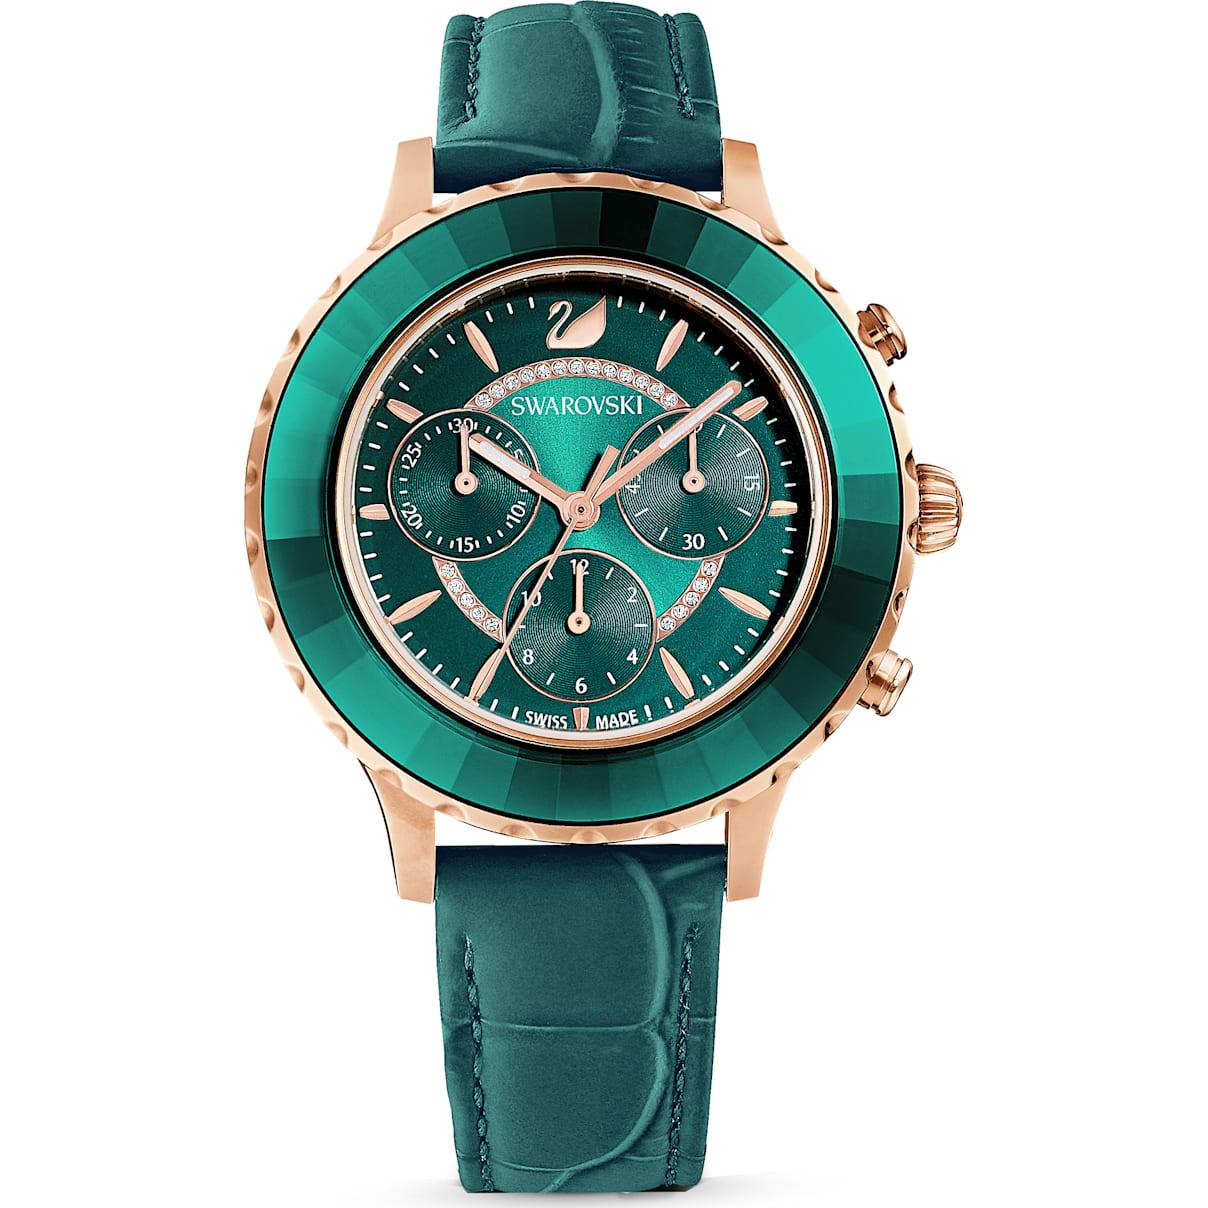 Swarovski Octea Lux Chrono Watch, Leather Strap, Green, Rose-gold tone PVD